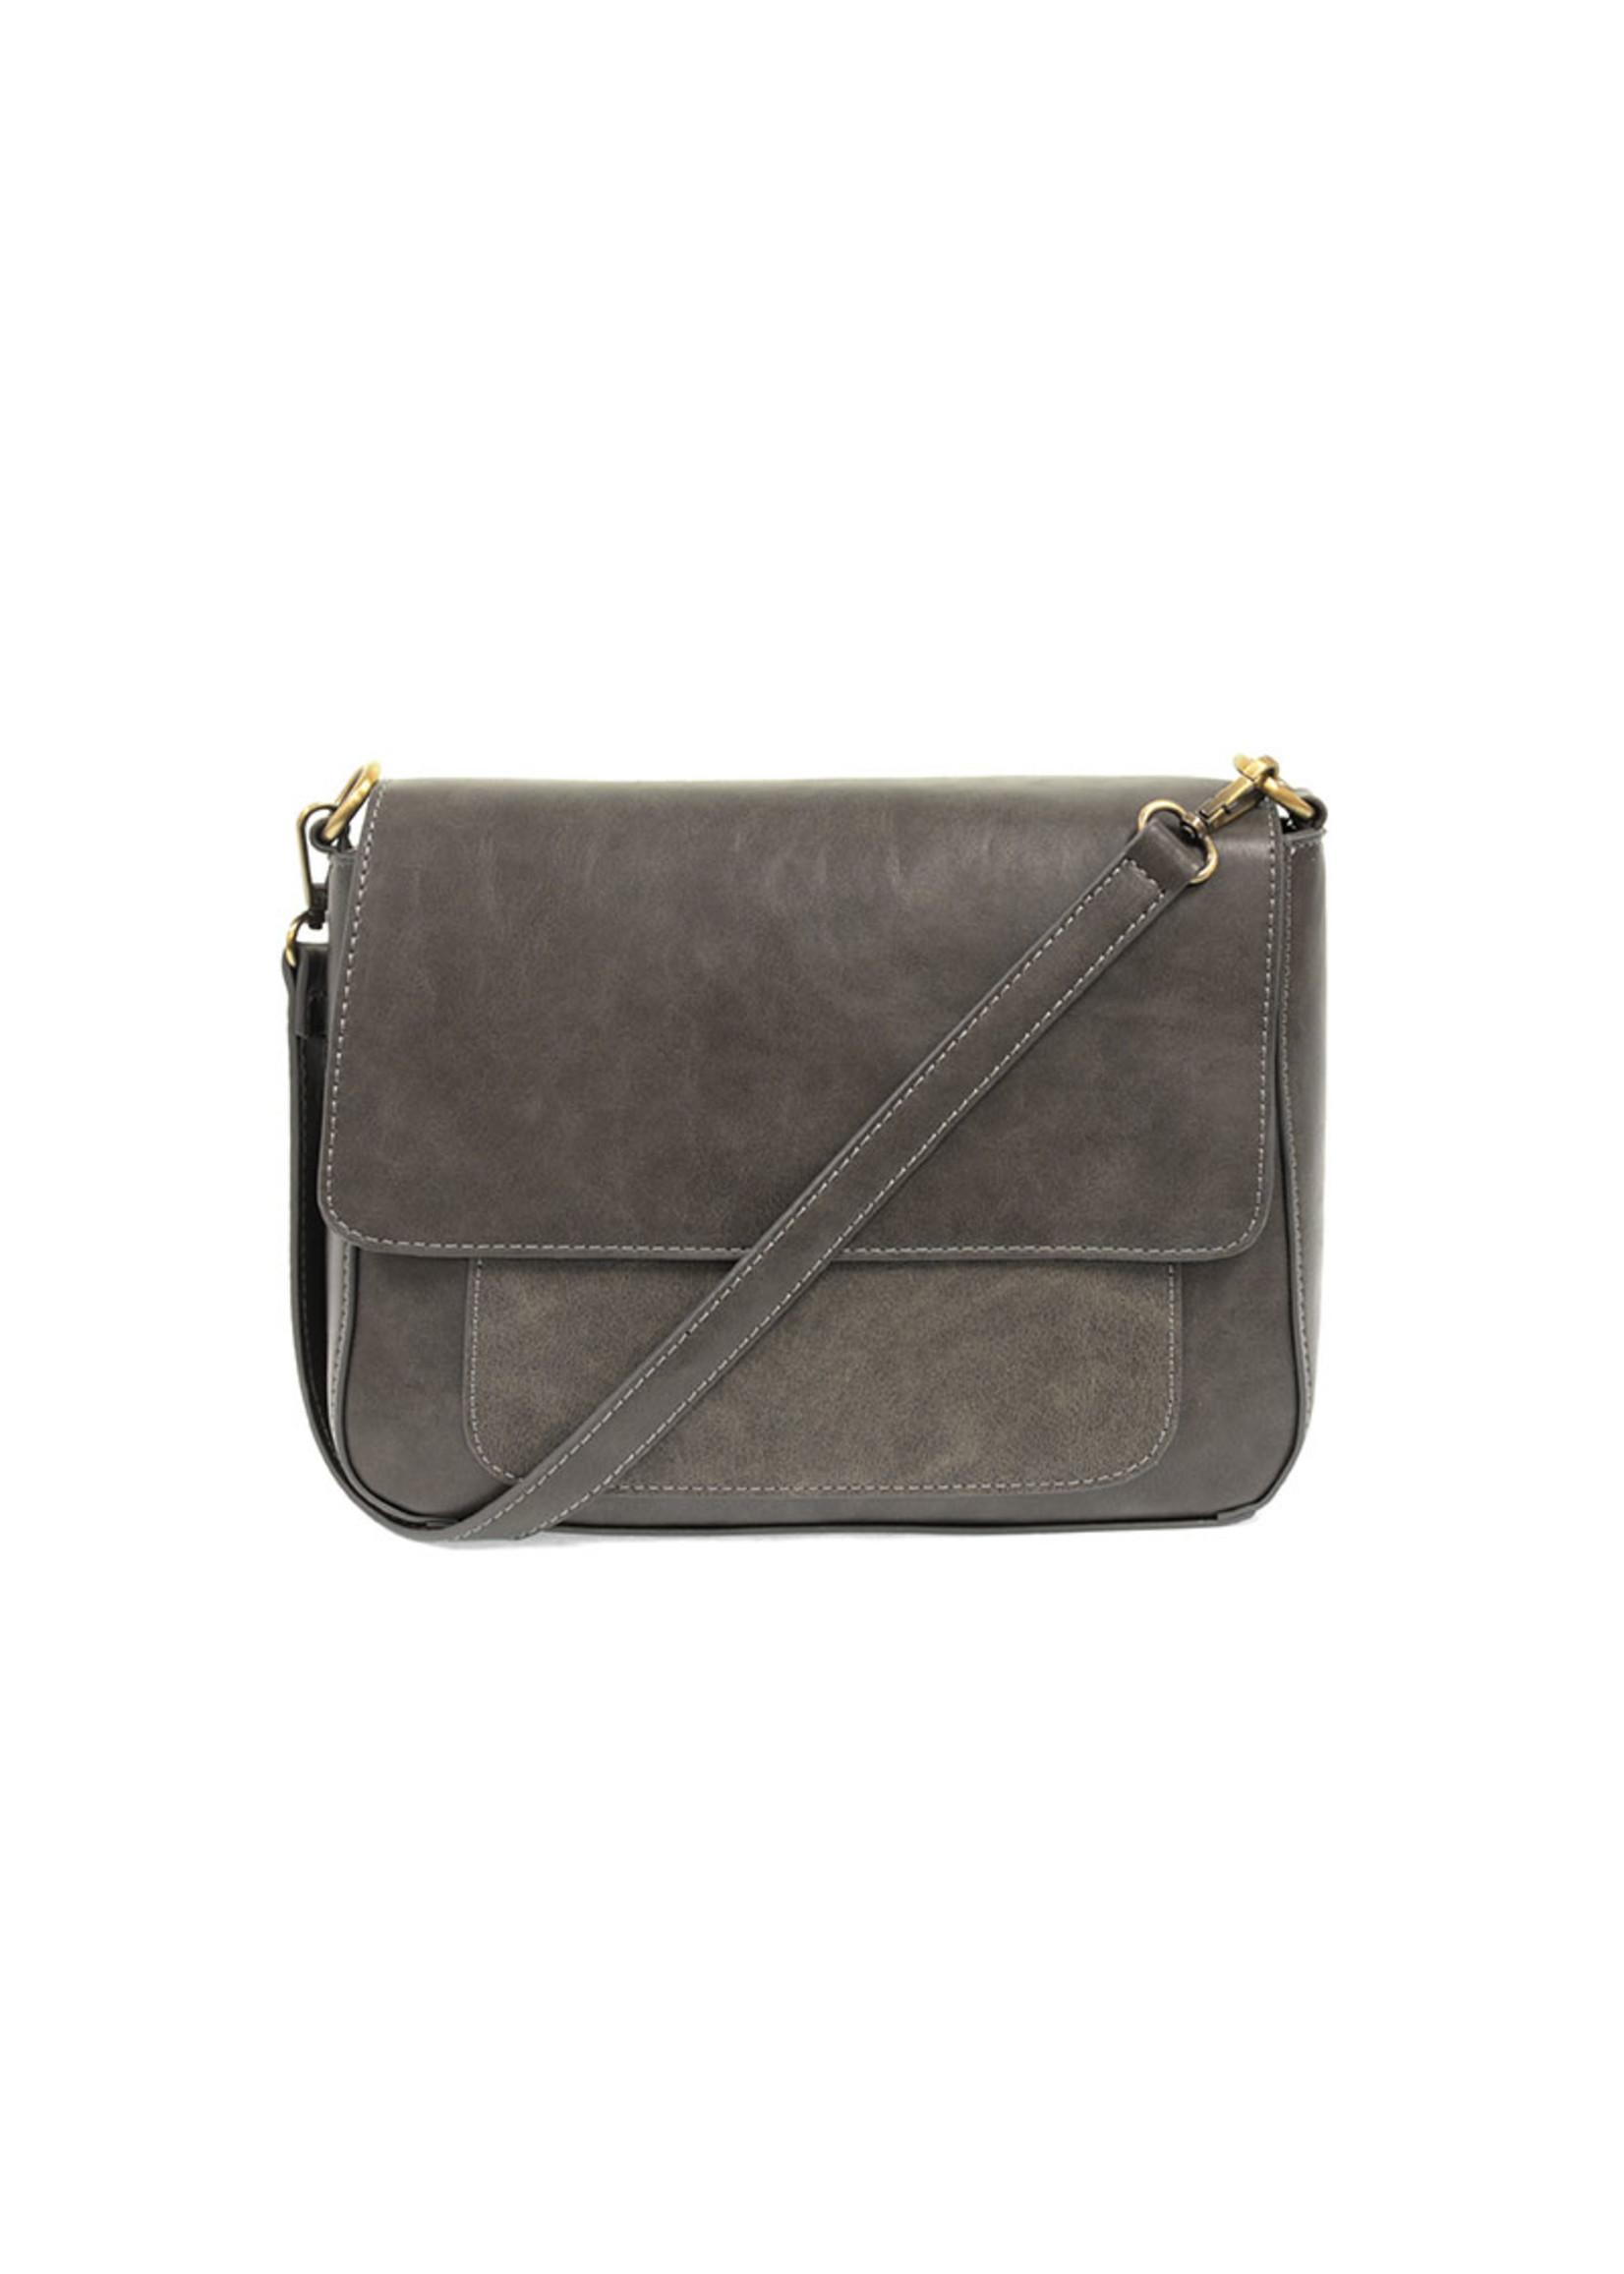 joy susan Lexie Convertible Shoulder Bag Grey